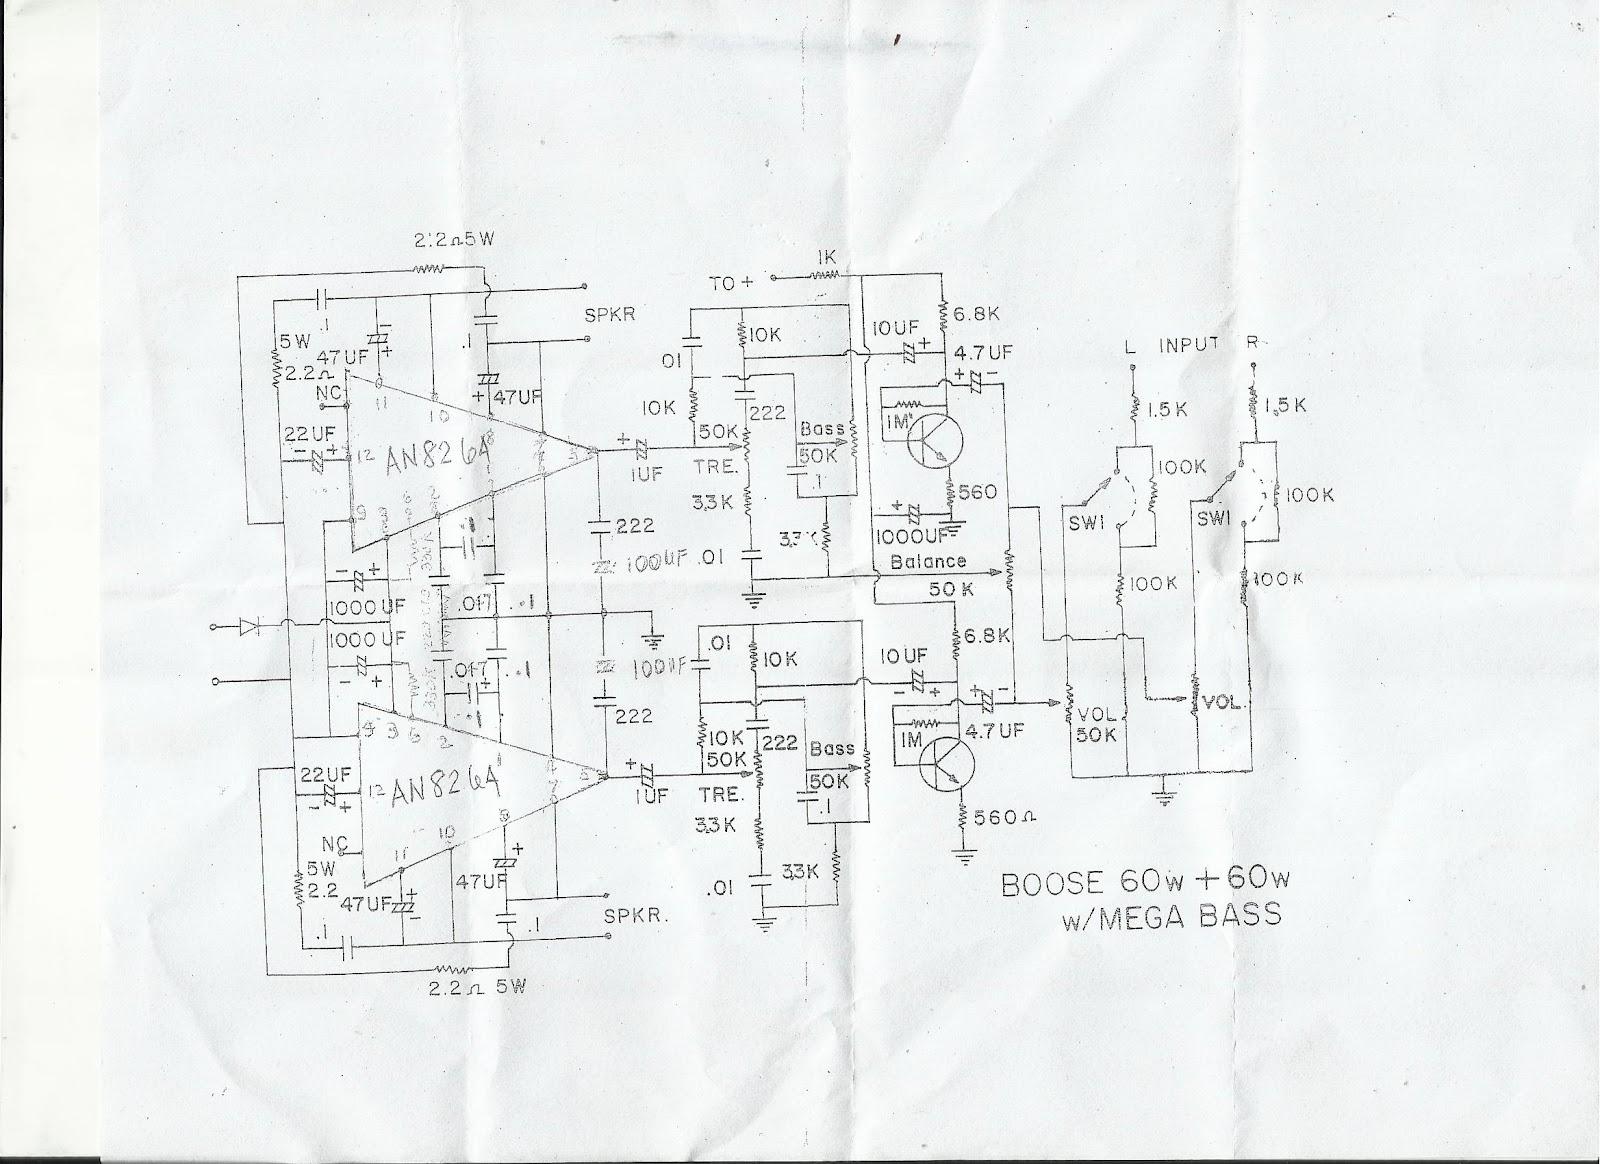 Audiokitsdiy 60w 60 W Sterero Amplifier Using An With Mega Bass